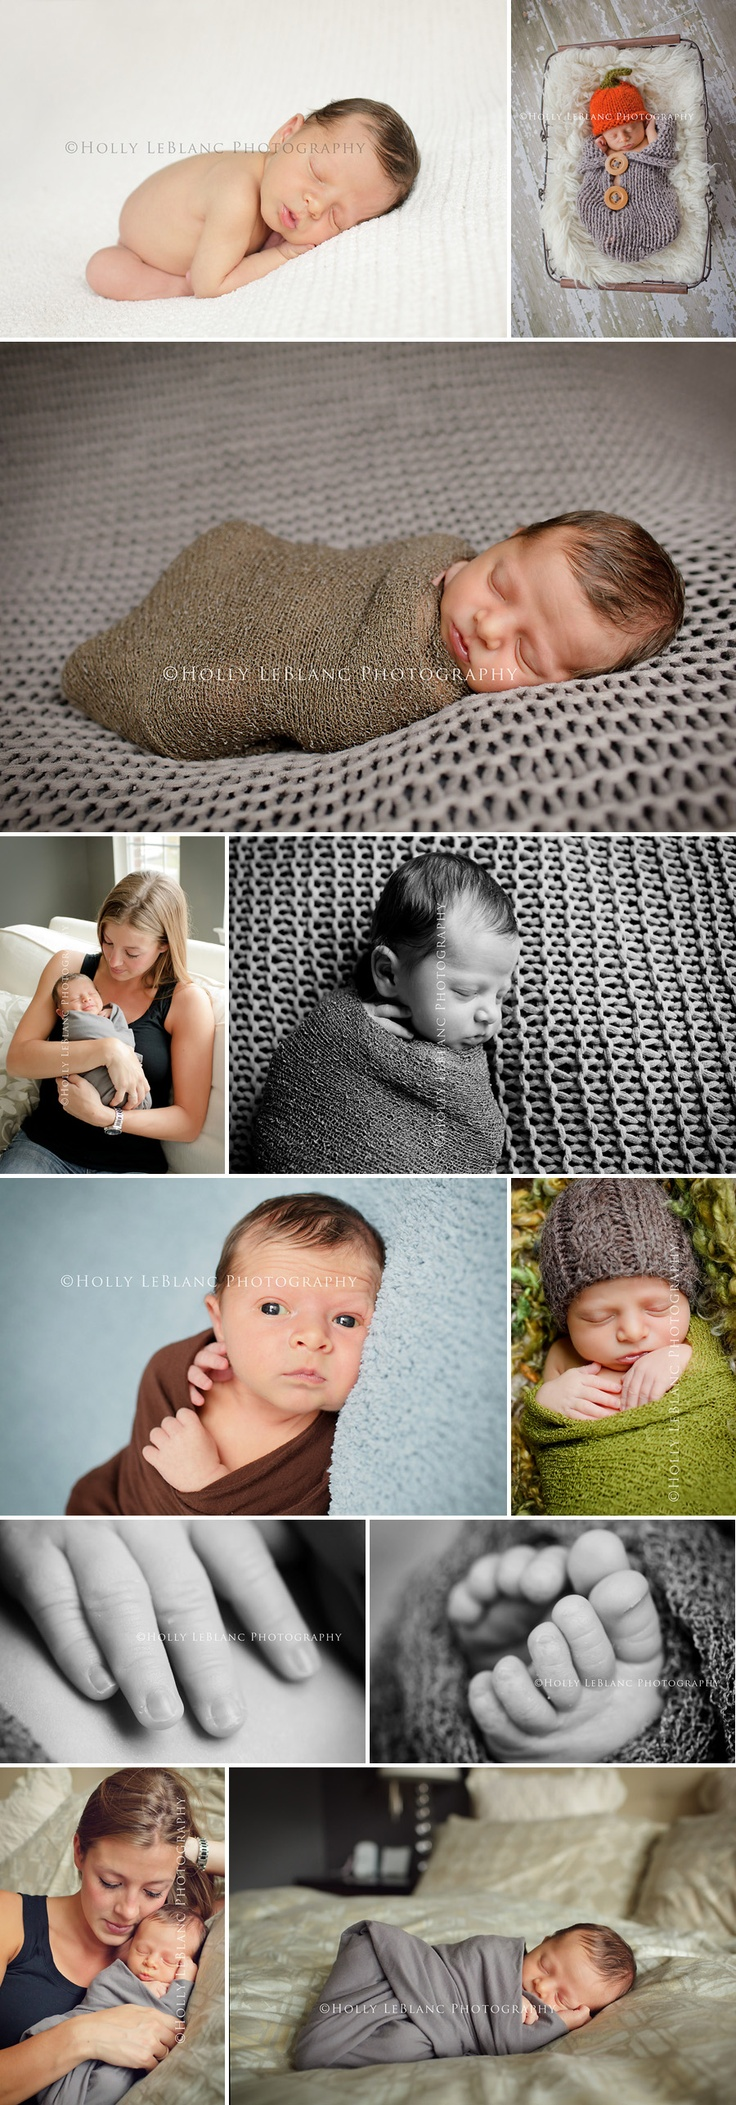 Cute newborn baby boy photos baby photo shoot ideas for Newborn baby boy pictures ideas